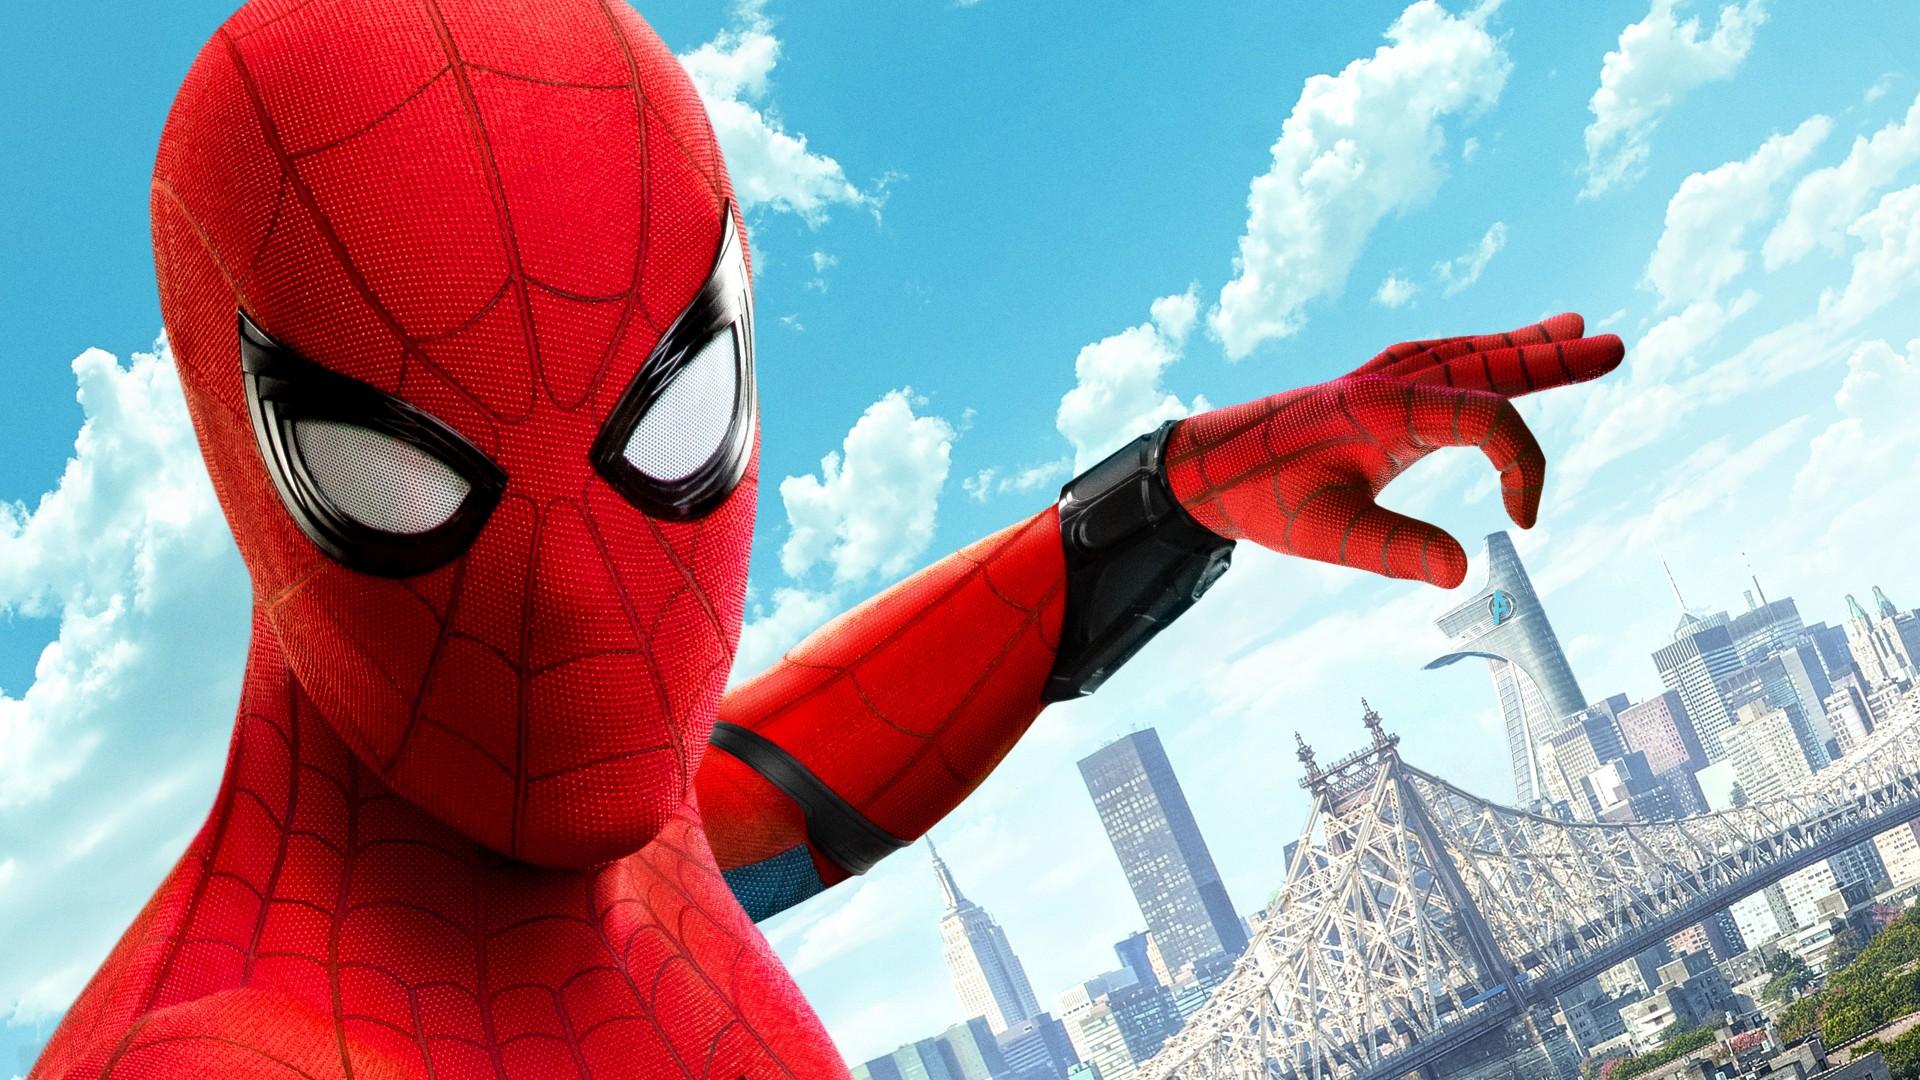 Iphone X Original Wallpaper Spider Man Homecoming 4k 8k Wallpapers Hd Wallpapers